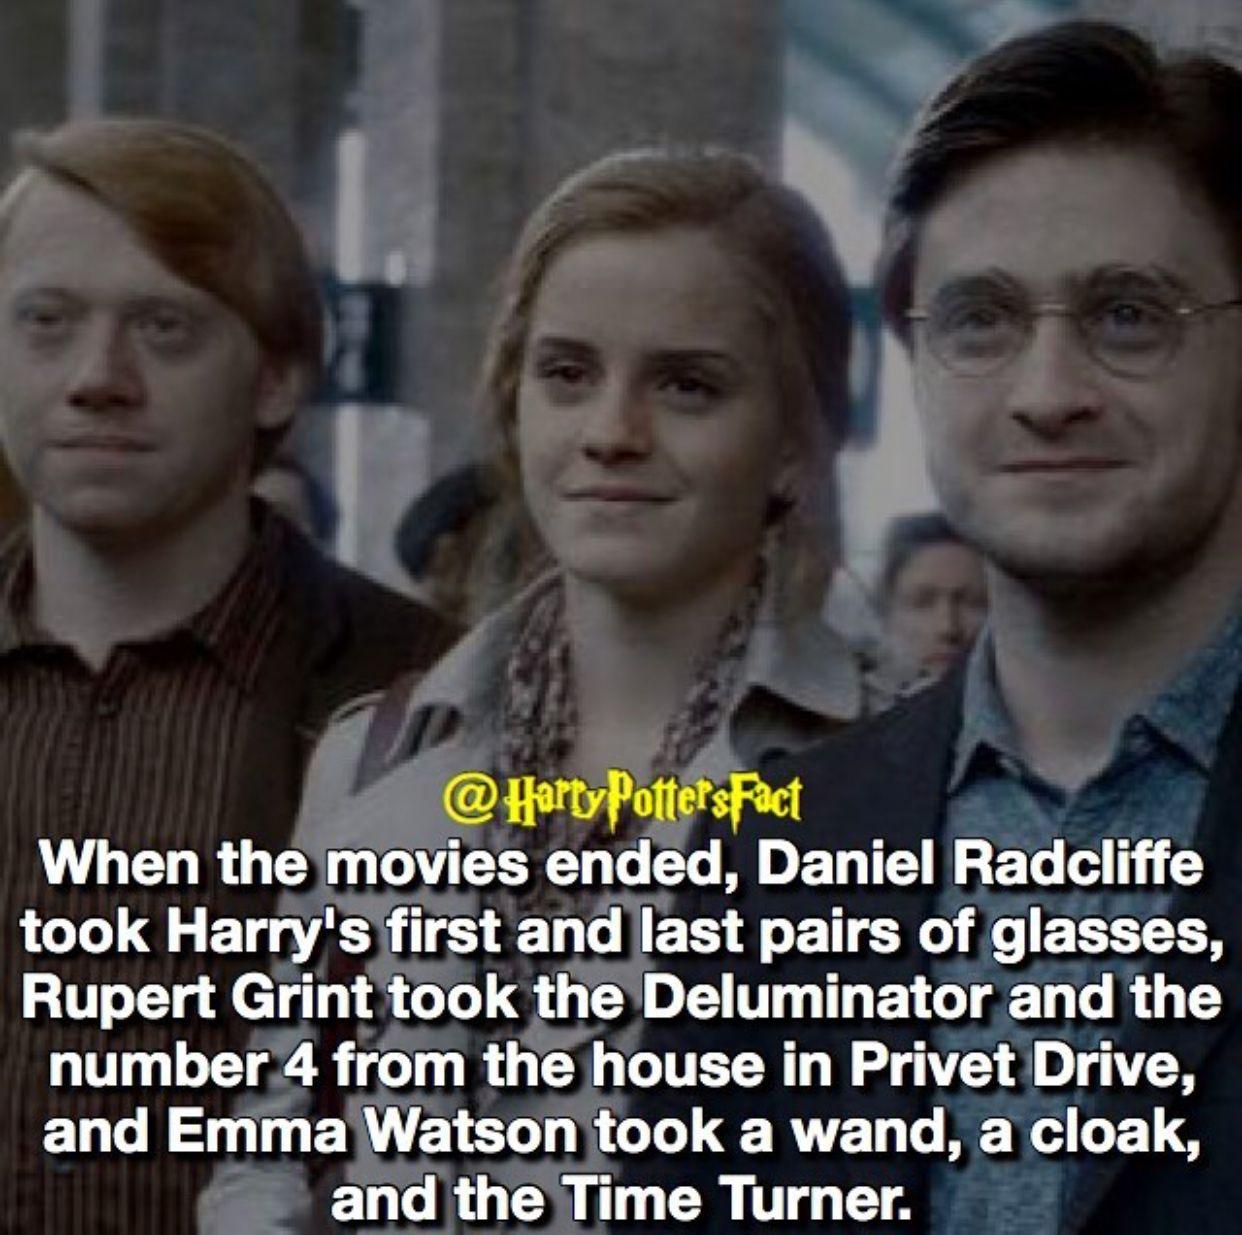 Don T Know If It S True But That S Cool If It Is Harry Potter Feels Harry Potter Facts Harry Potter Wizard